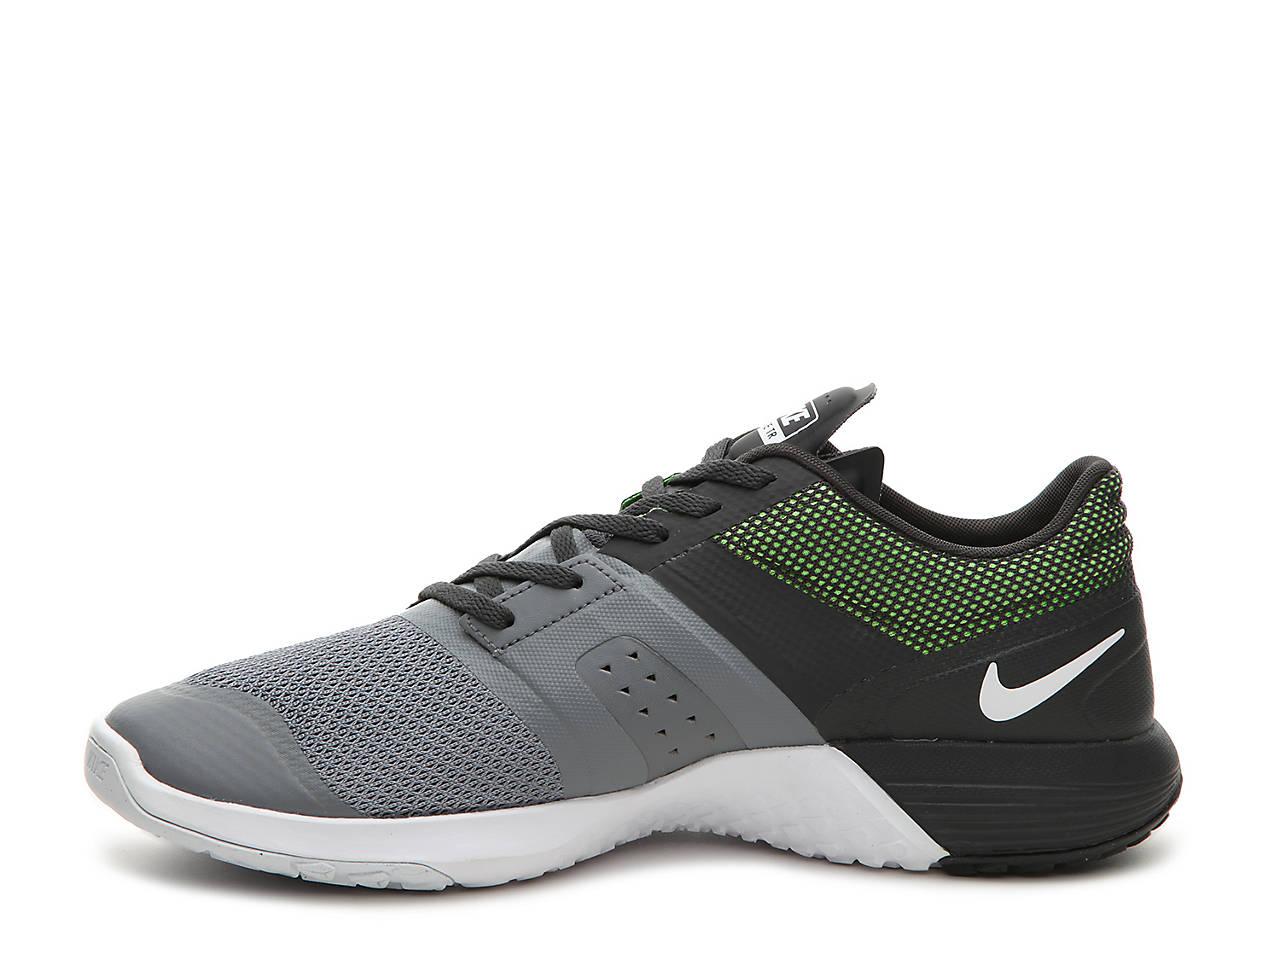 f616039c36c1 ... running shoes dsw c146e f2abb  usa free trainer 5.0 dsw nike fs lite  trainer 3 training shoe mens 5838d 0370b